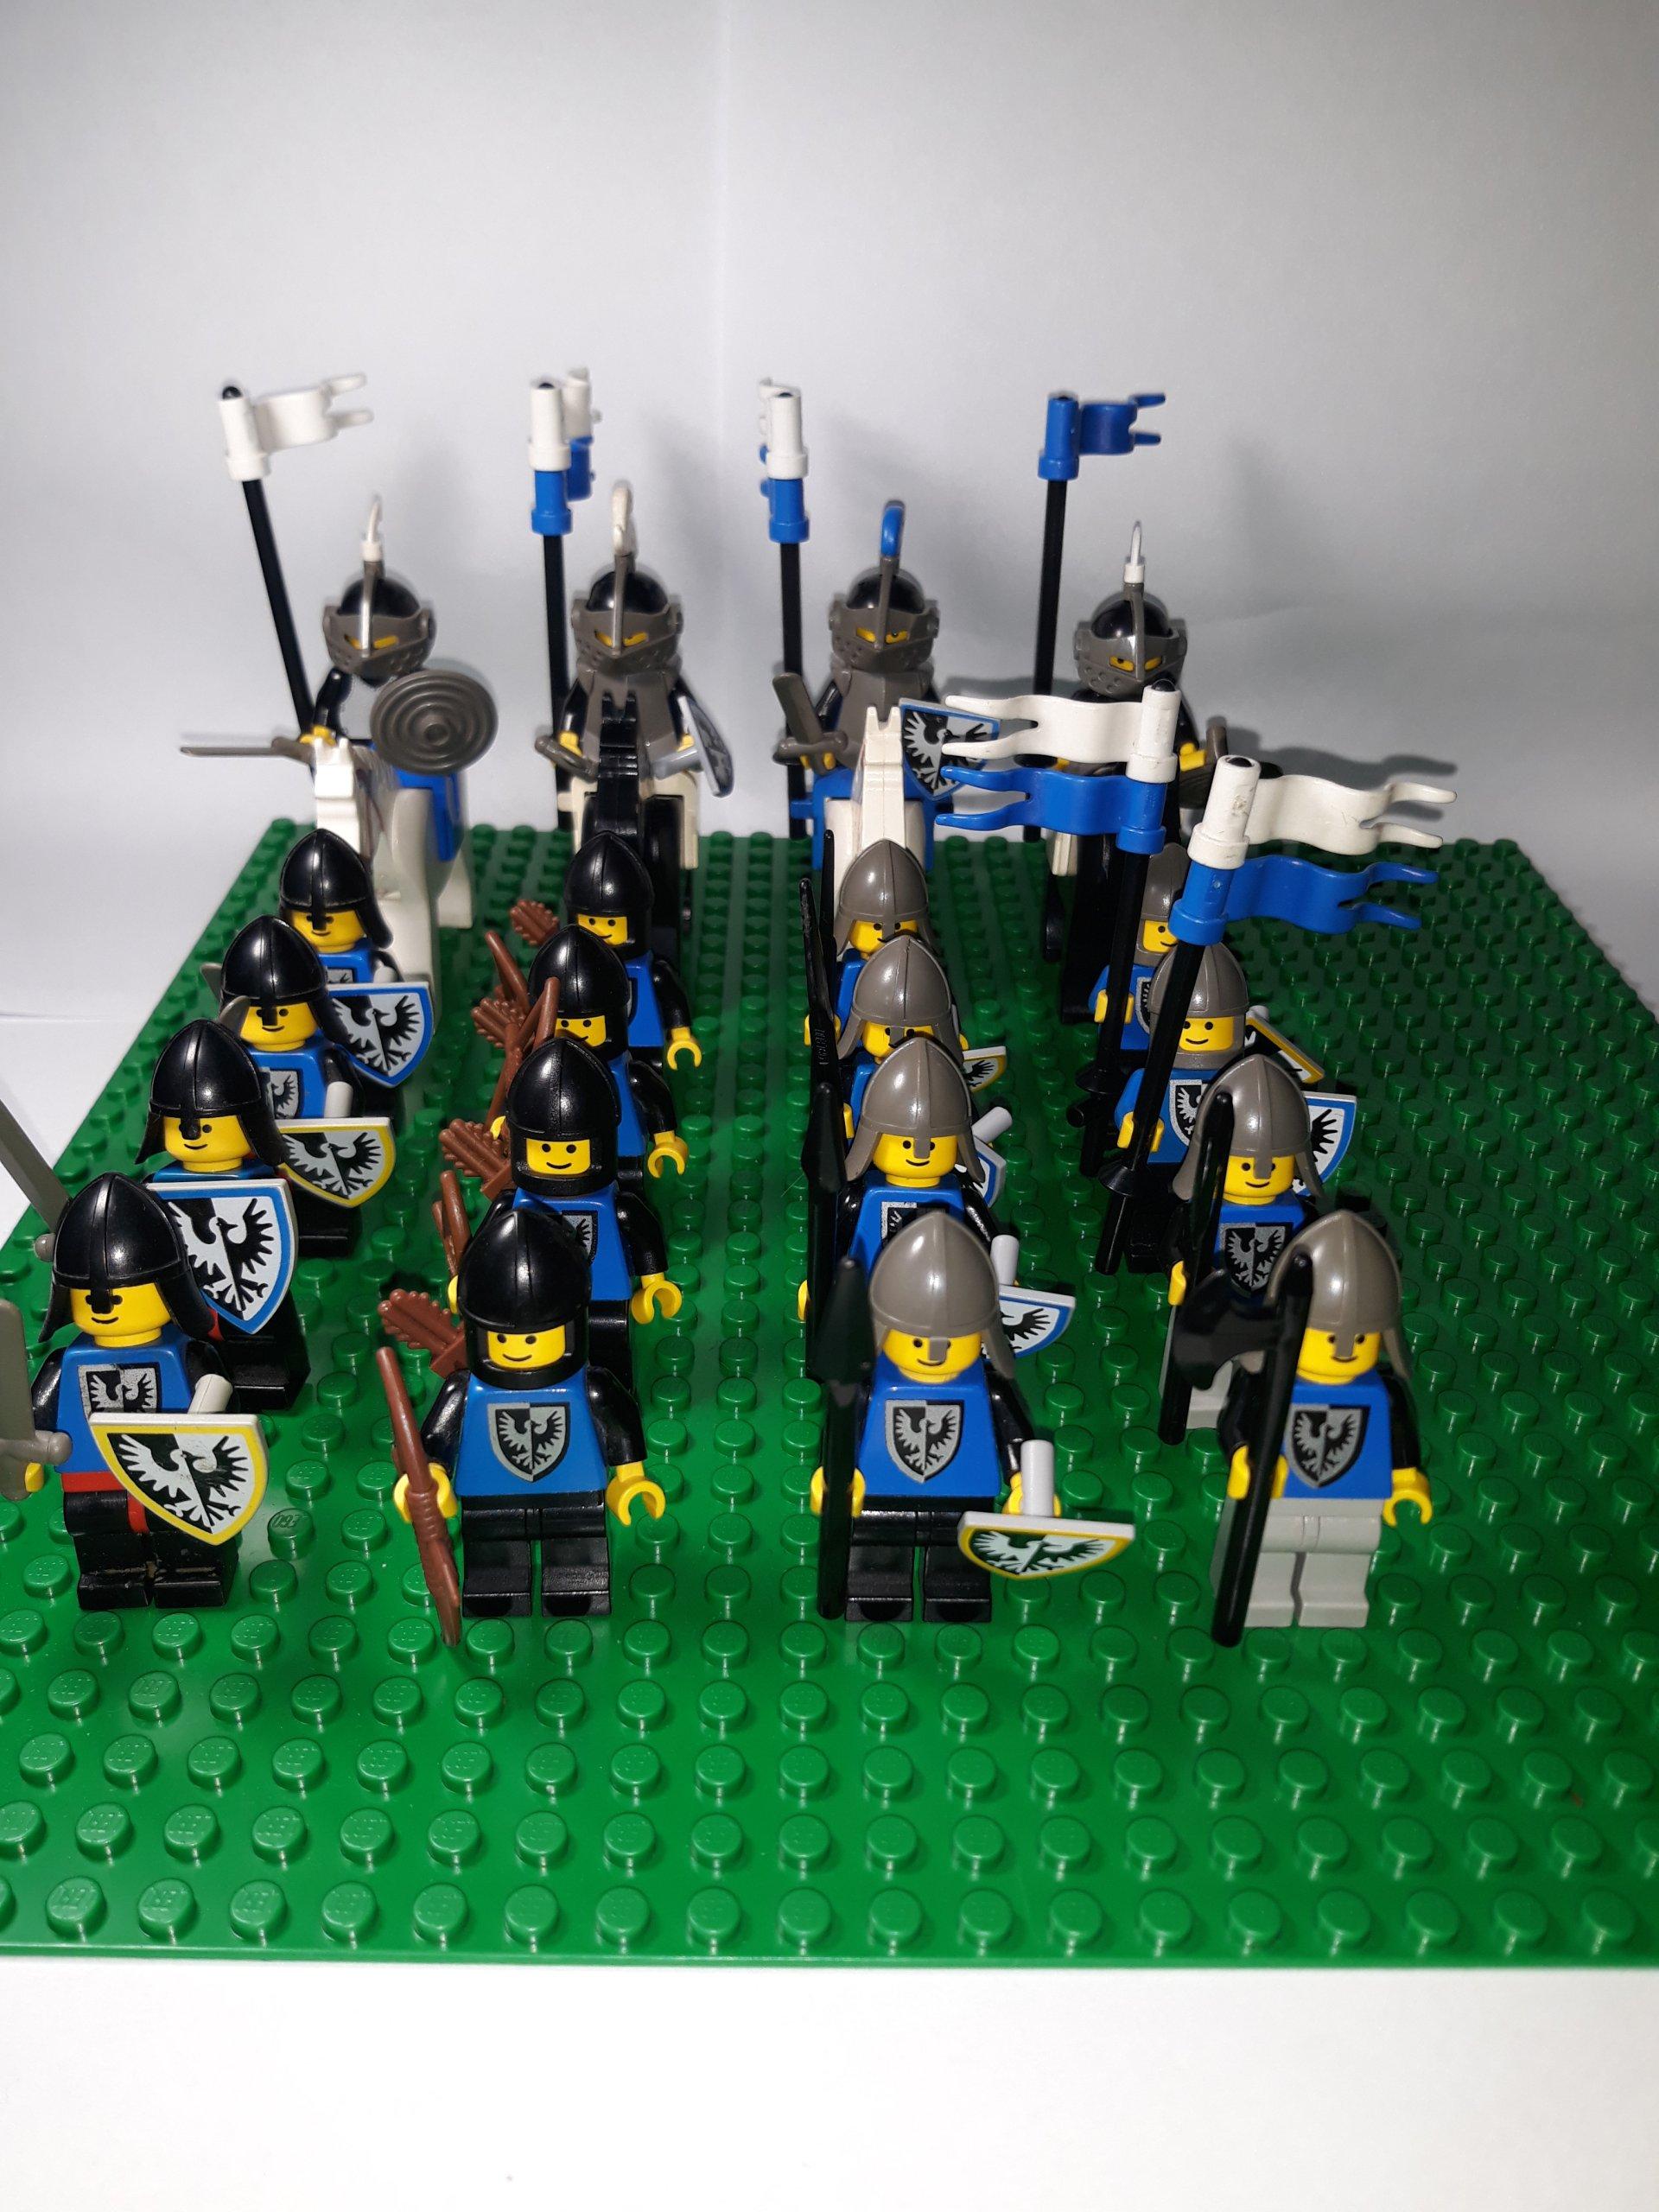 Lego Castle Zamek Rycerze Armia Black Falcons 7133436284